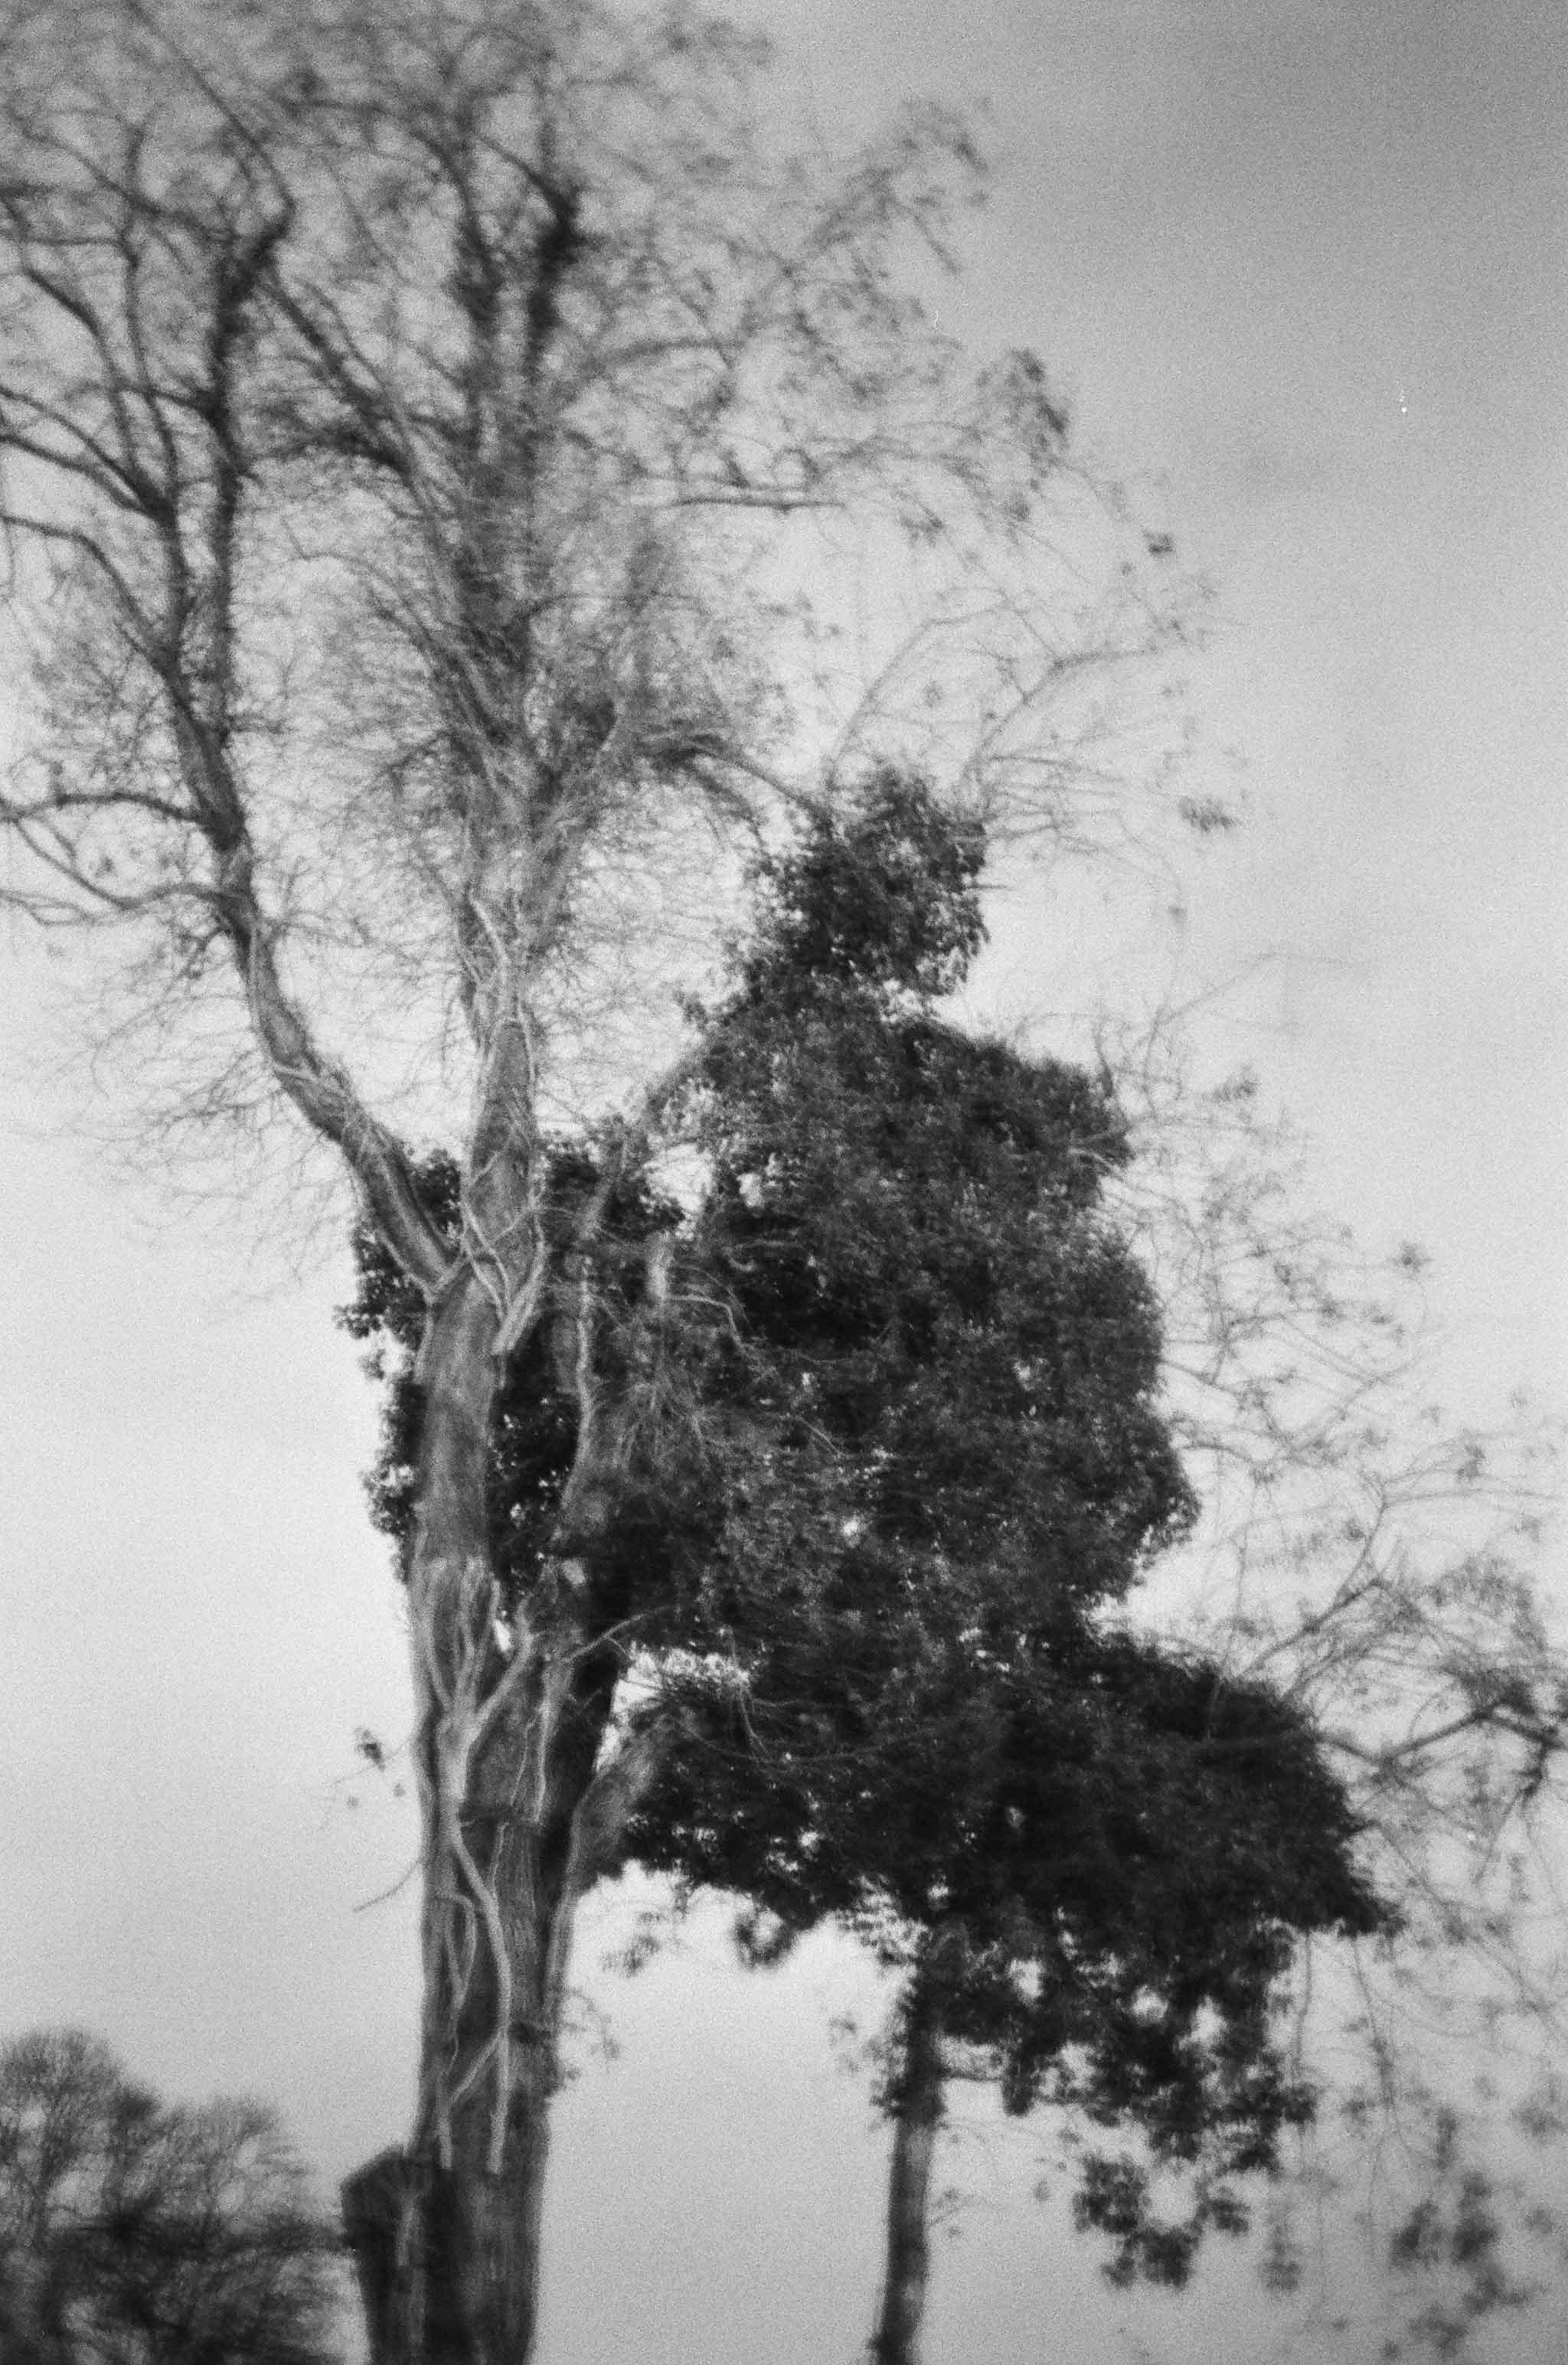 ChristosVourlis_photography_CVHAIR_CVDIARY_personal diary__film_35mm_11630005.JPG